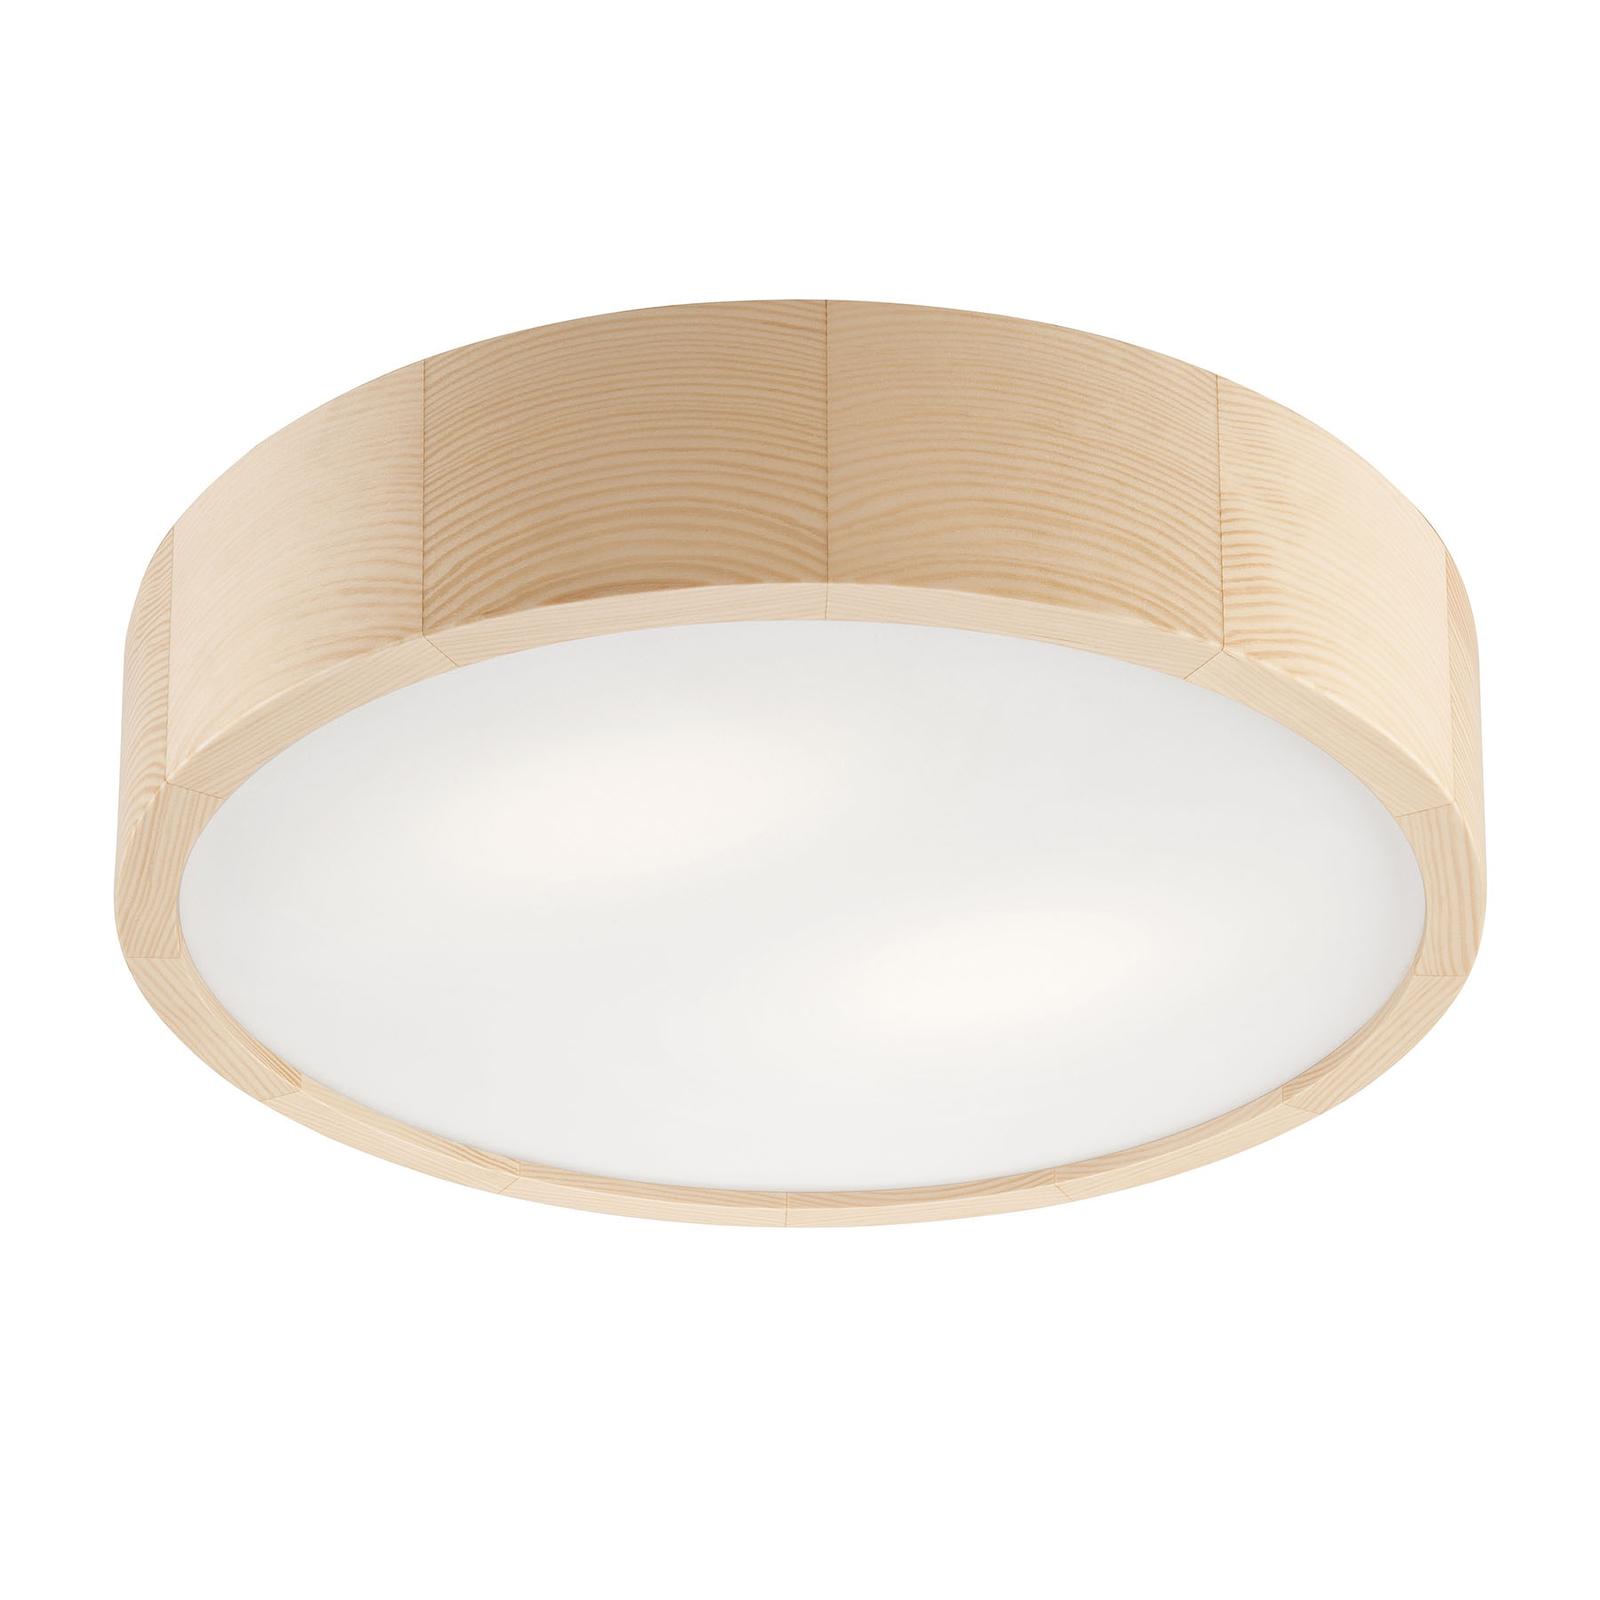 Deckenlampe Kerio, Ø 37 cm, kiefer natur